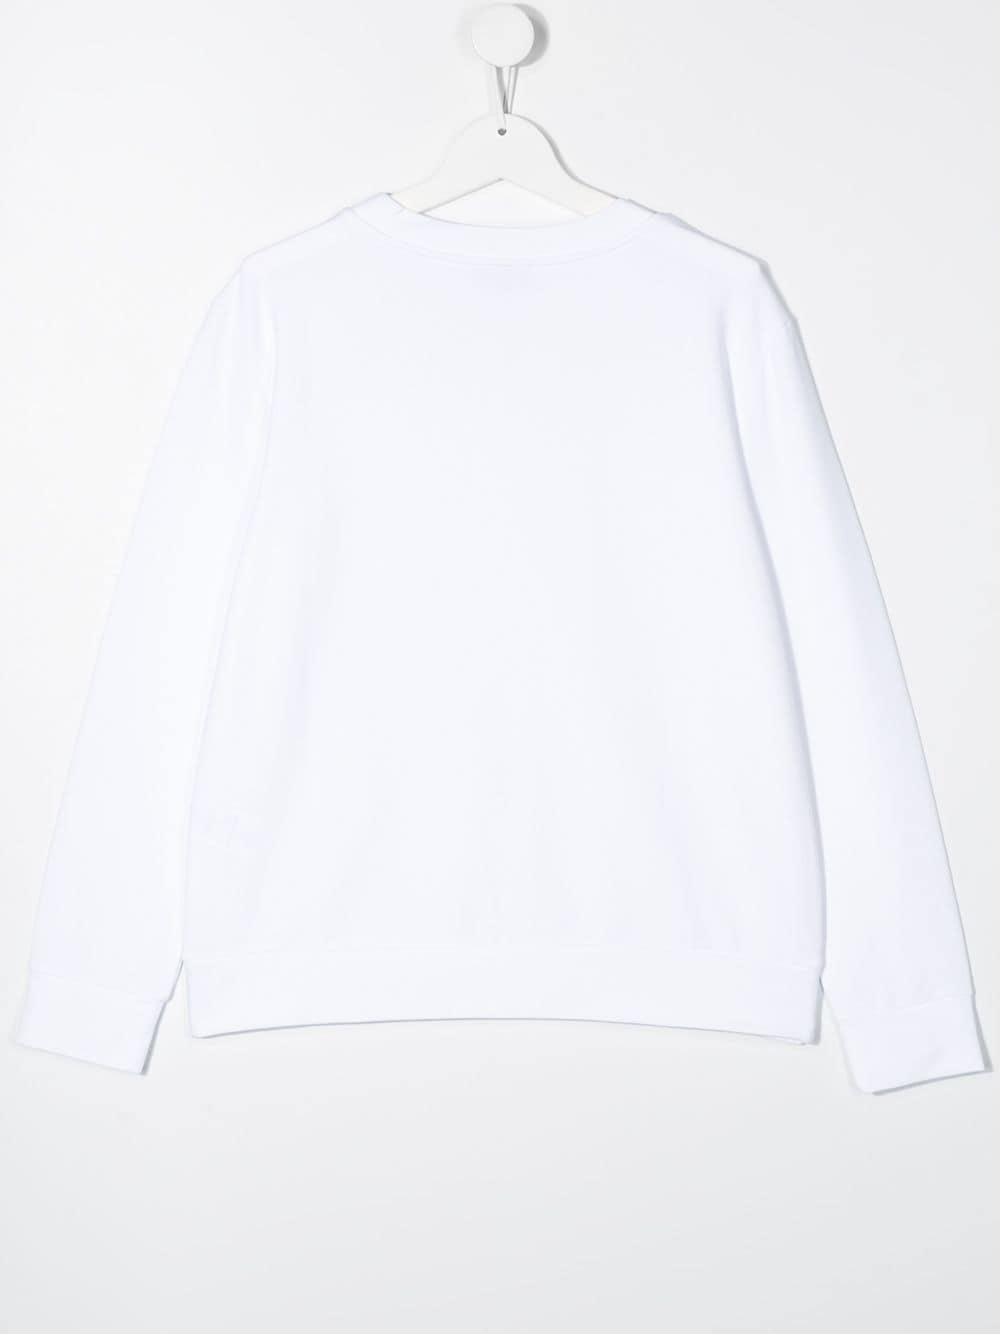 EMILIO PUCCI | Sweatshirt | 9M4000MX180100T